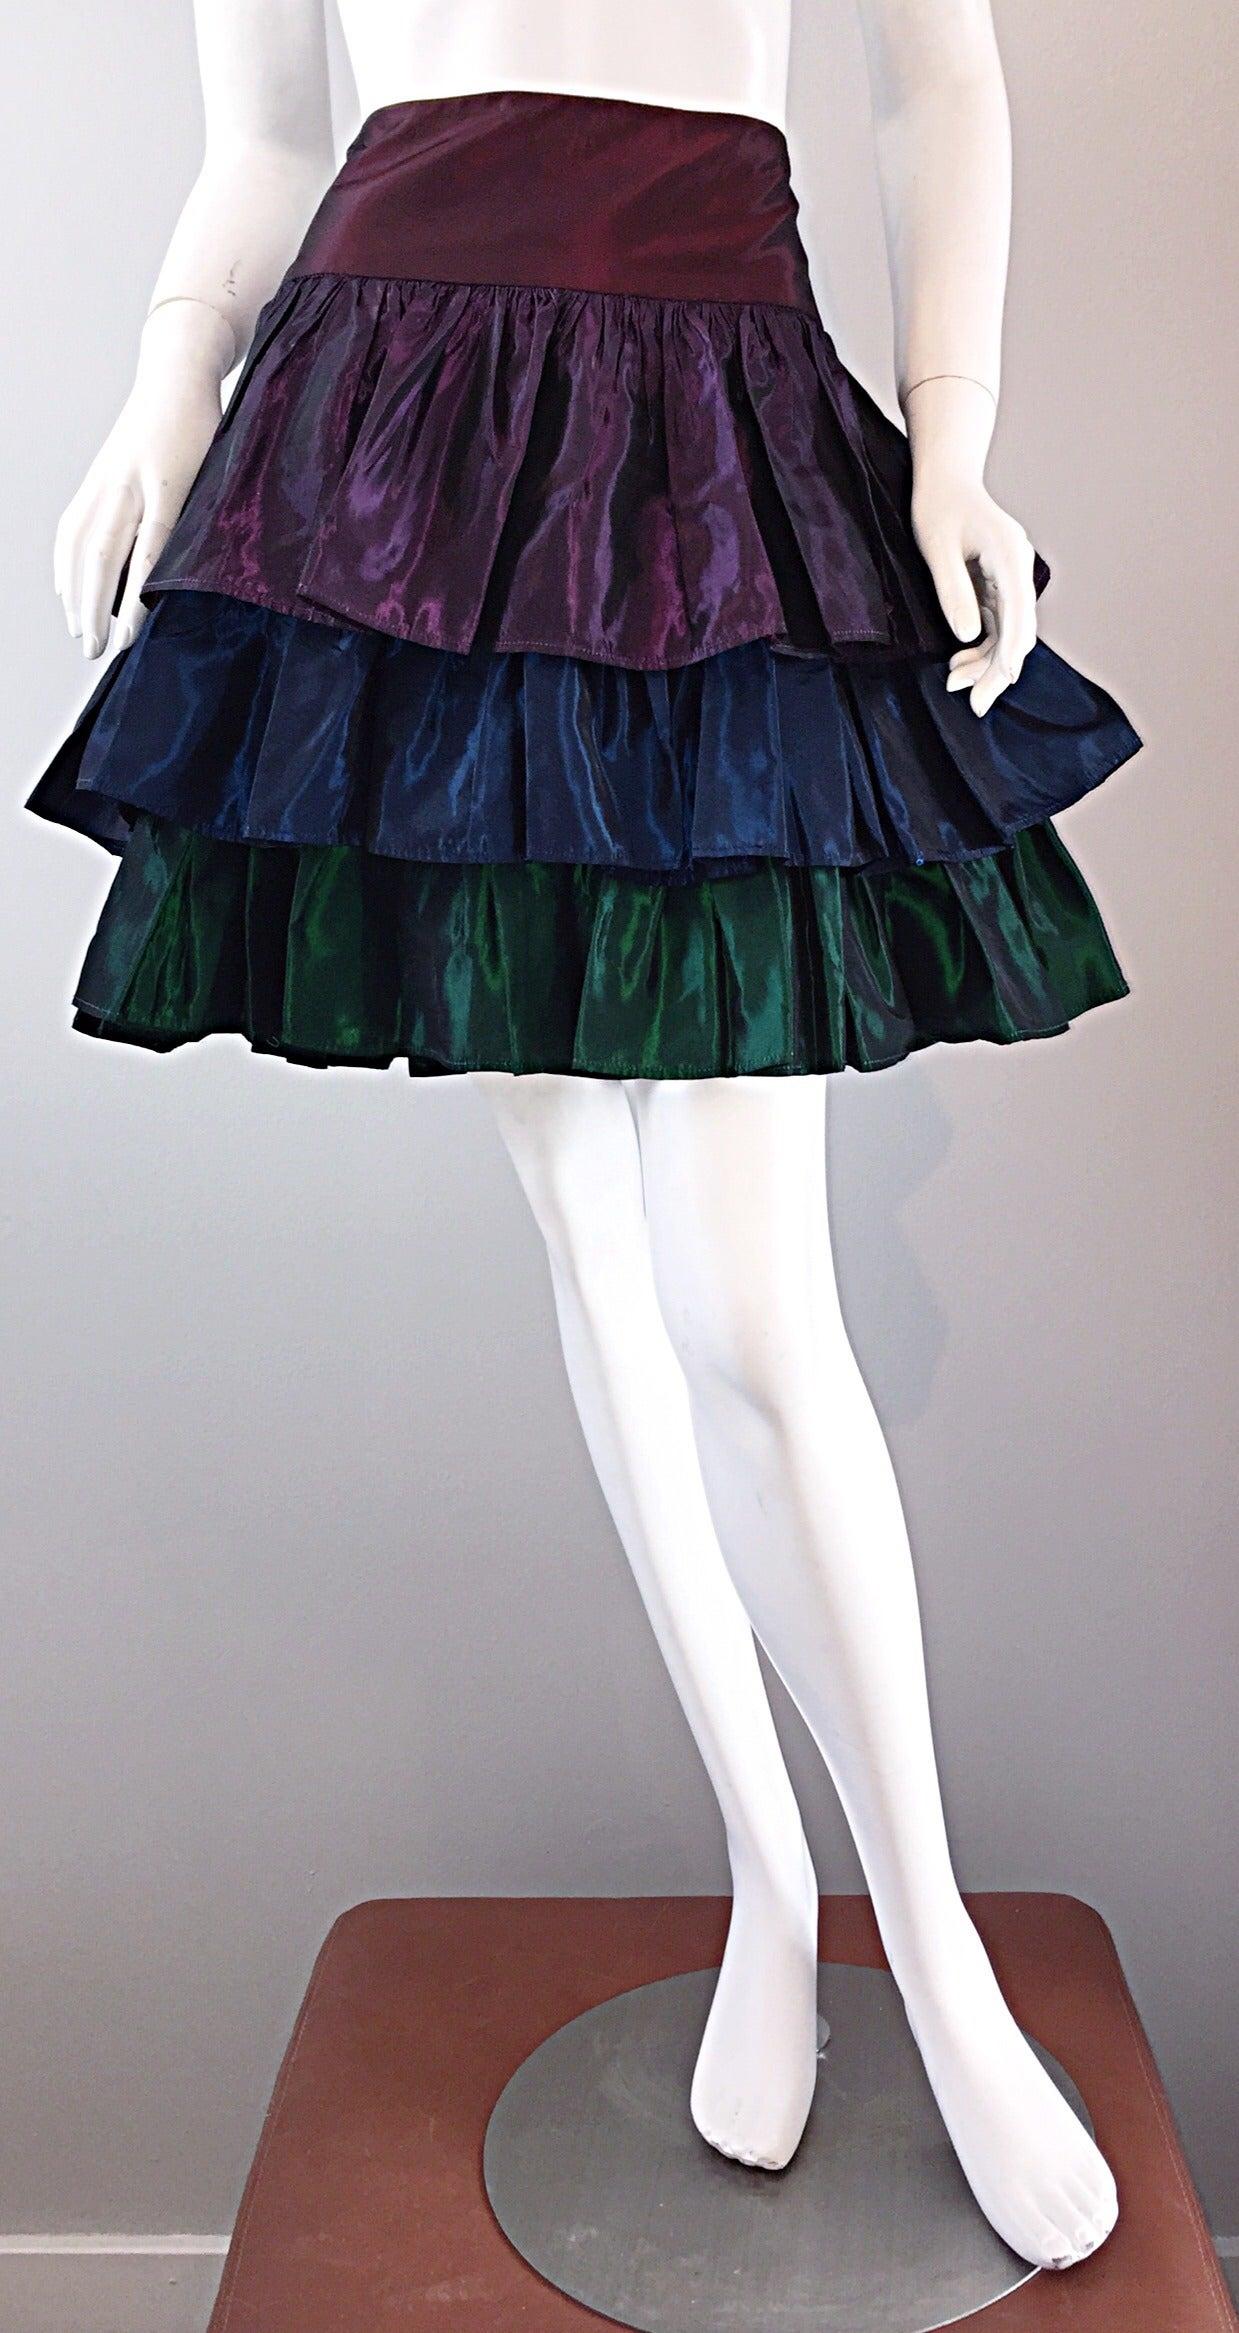 Kalinka For Bergdorf Goodman Tiered Taffeta ' Rainbow ' Vintage Skirt 3